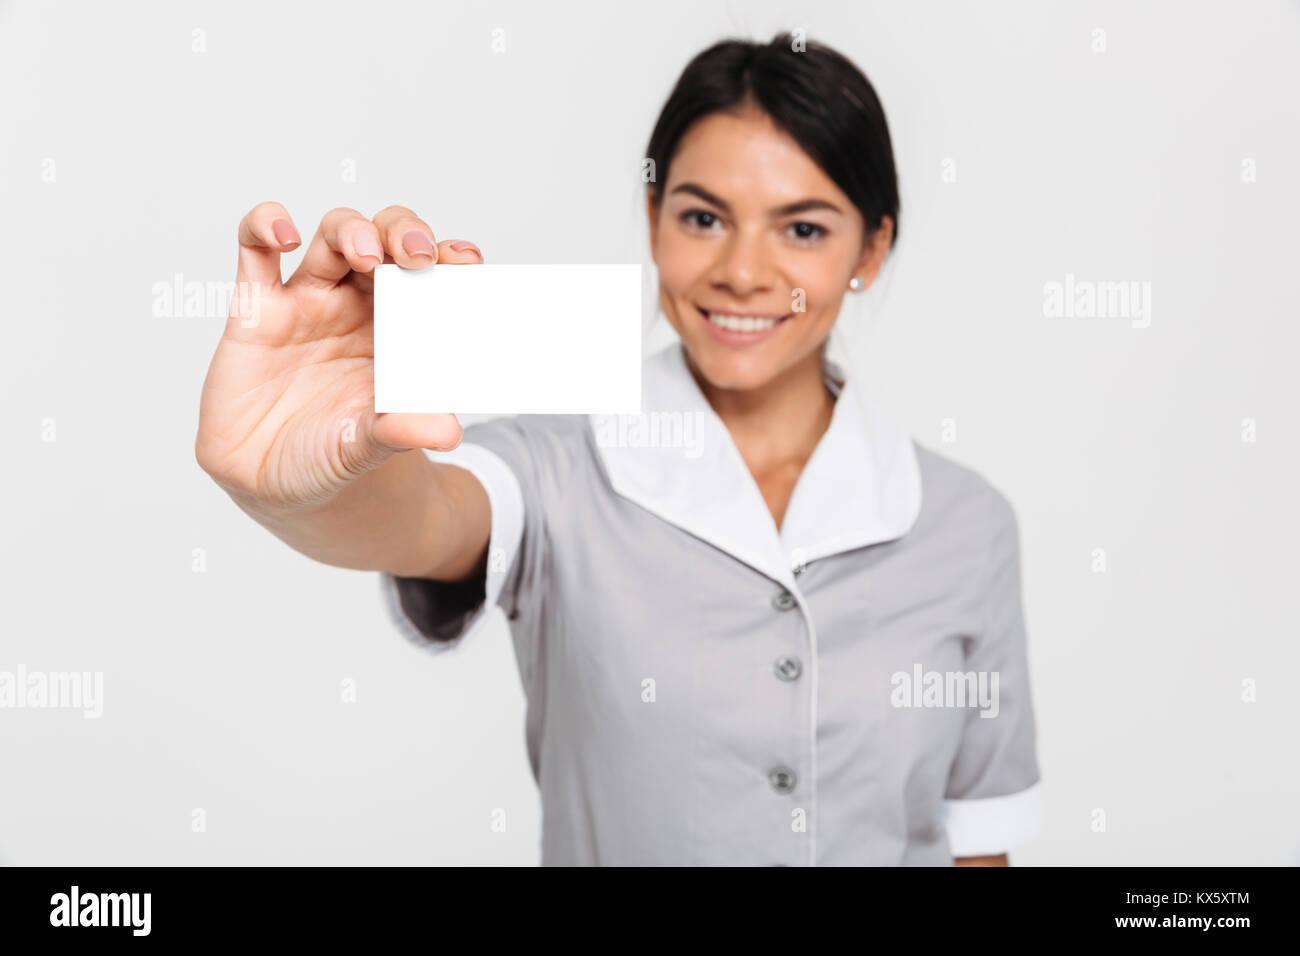 Junge attraktive femmale Haushälterin in Uniform zeigt leere Cutaway, selektiver Fokus auf Karte Stockfoto